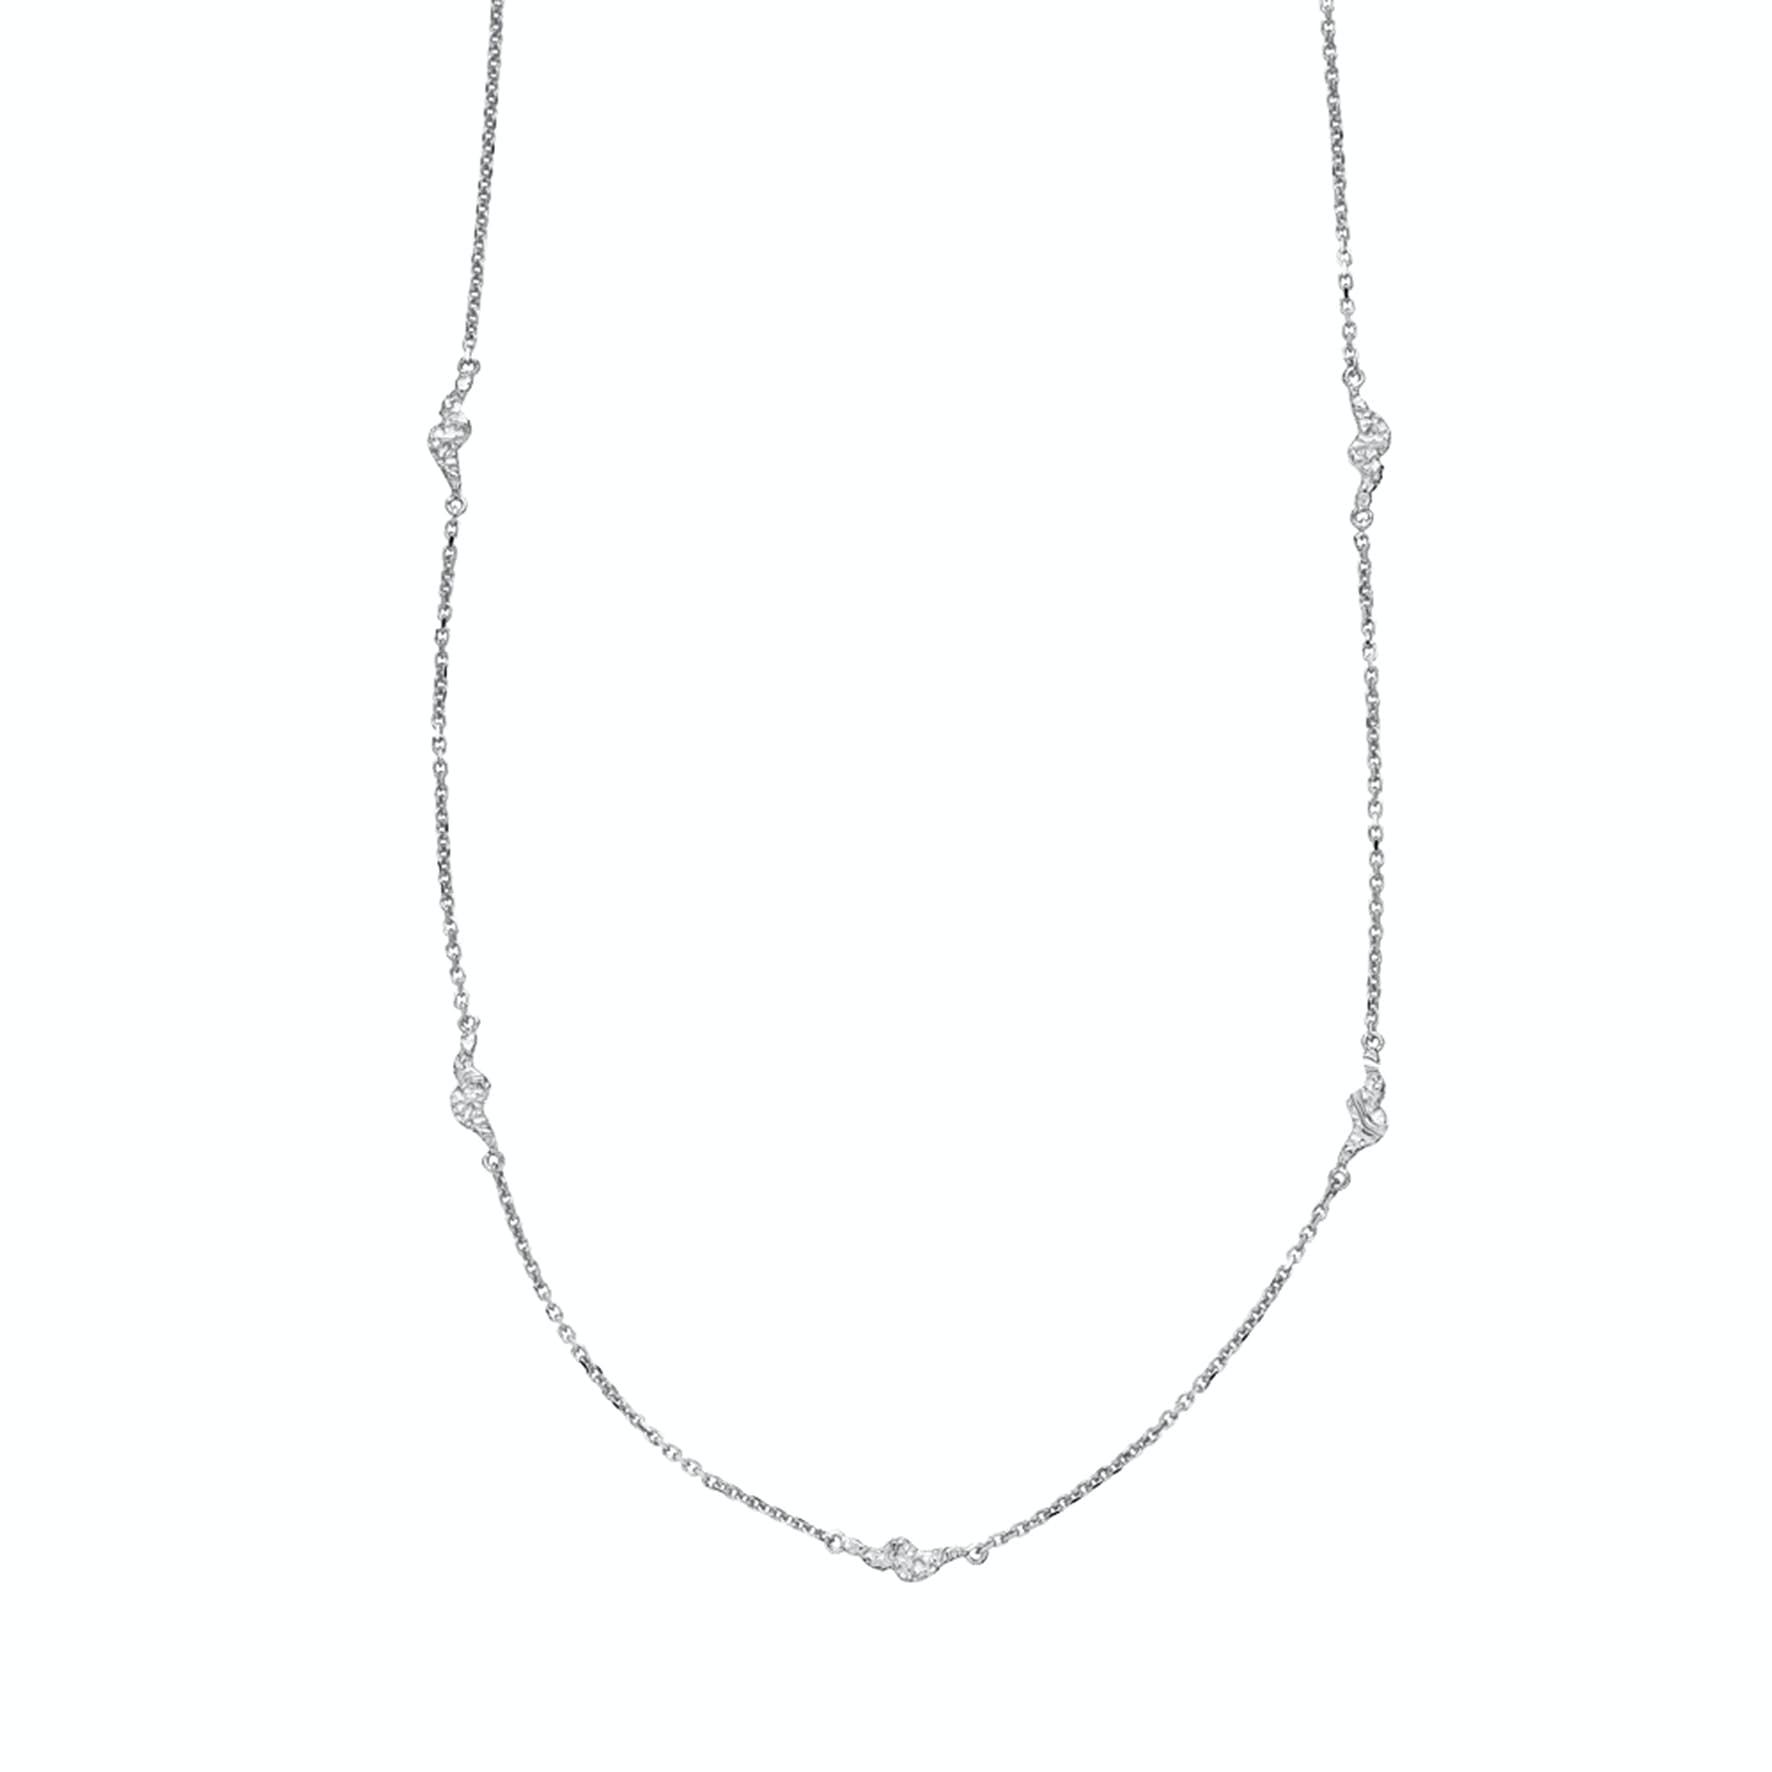 Silke By Sistie Necklace von Sistie in Silber Sterling 925 Blank